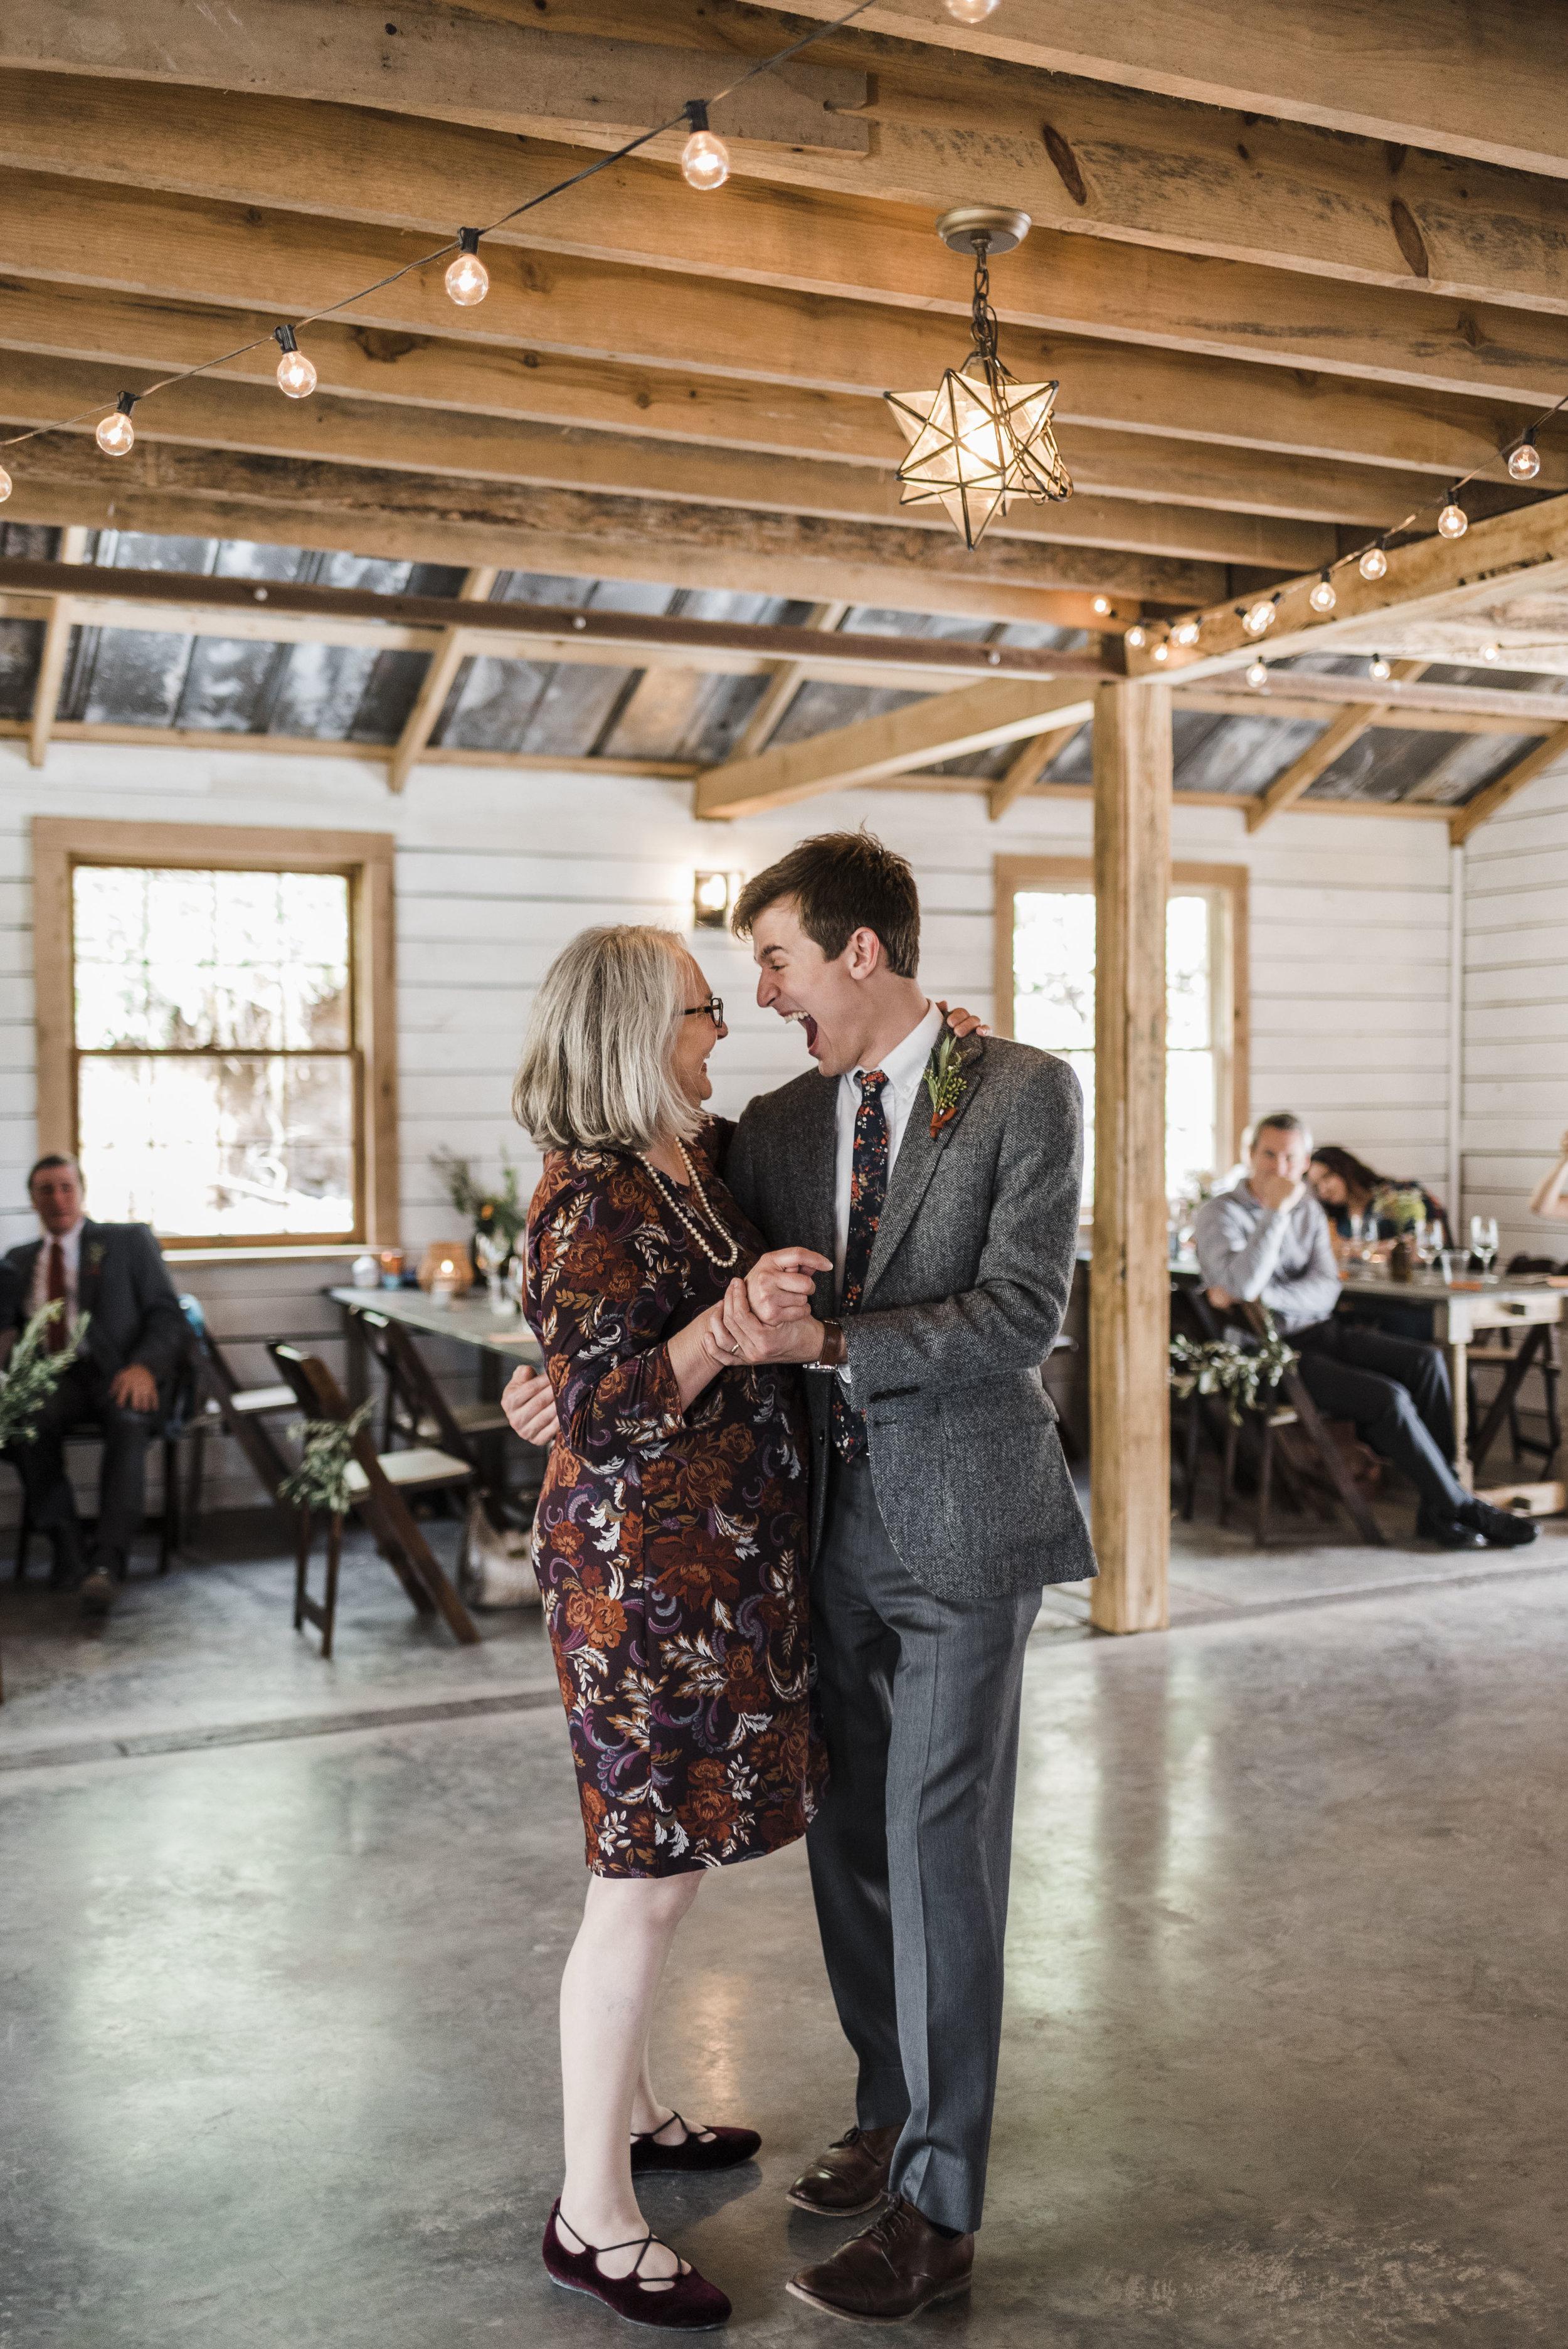 wedding mother son dance chattanooga Tennessee barn